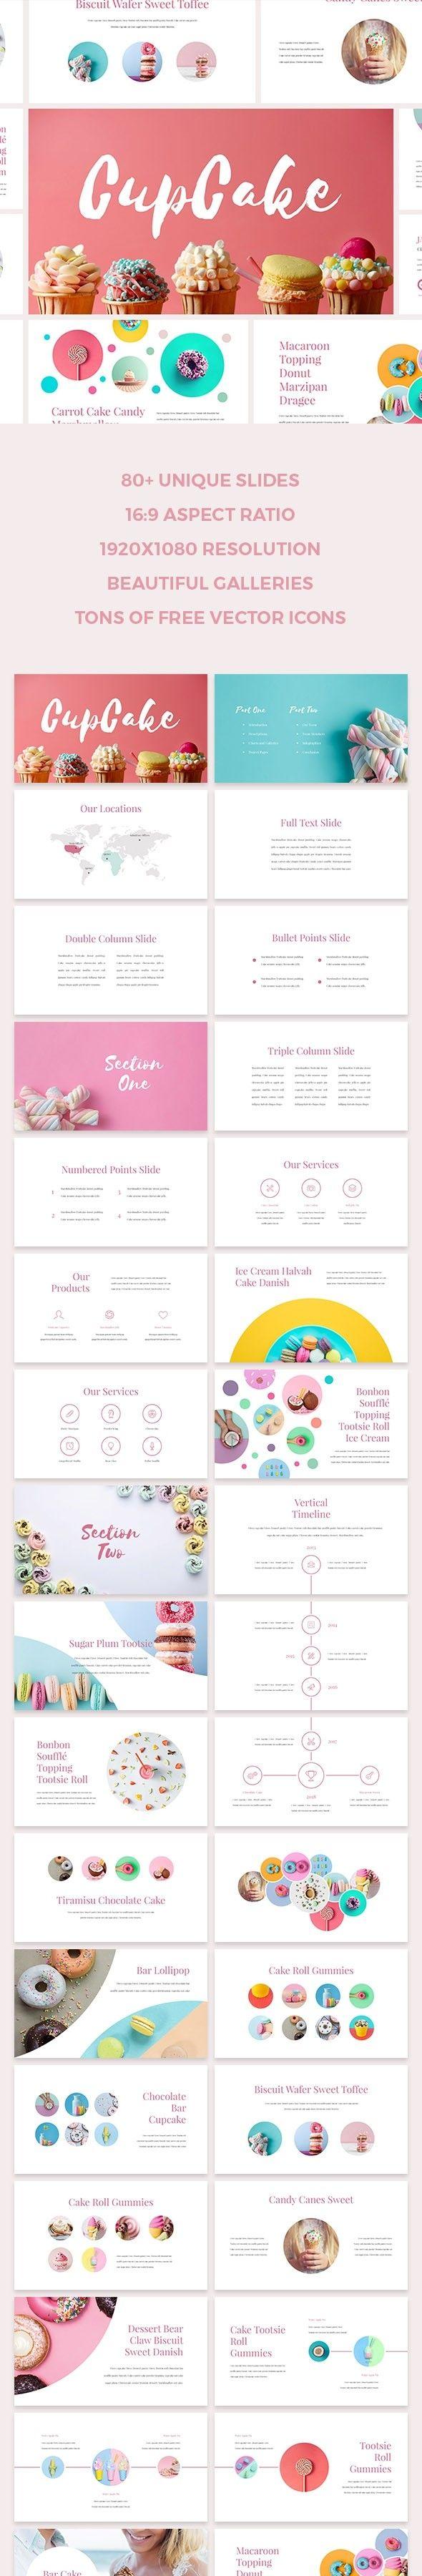 advertisement baby shower best powerpoint templates branding